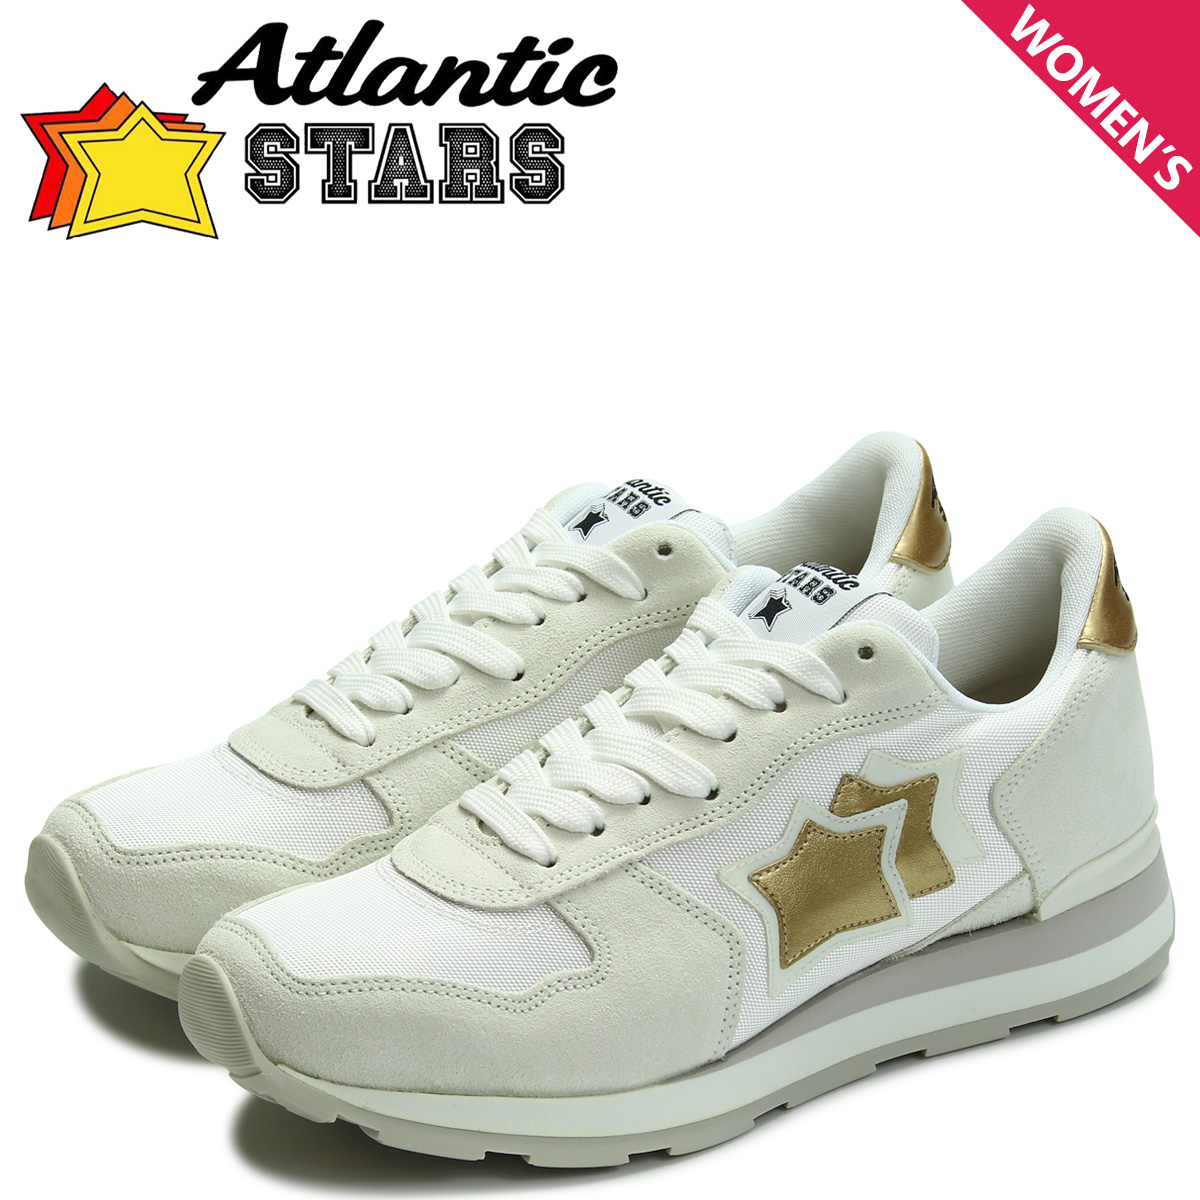 Atlantic STARS アトランティックスターズ スニーカー レディース ベガ VEGA ホワイト 白 BO-86B [4/3 再入荷]